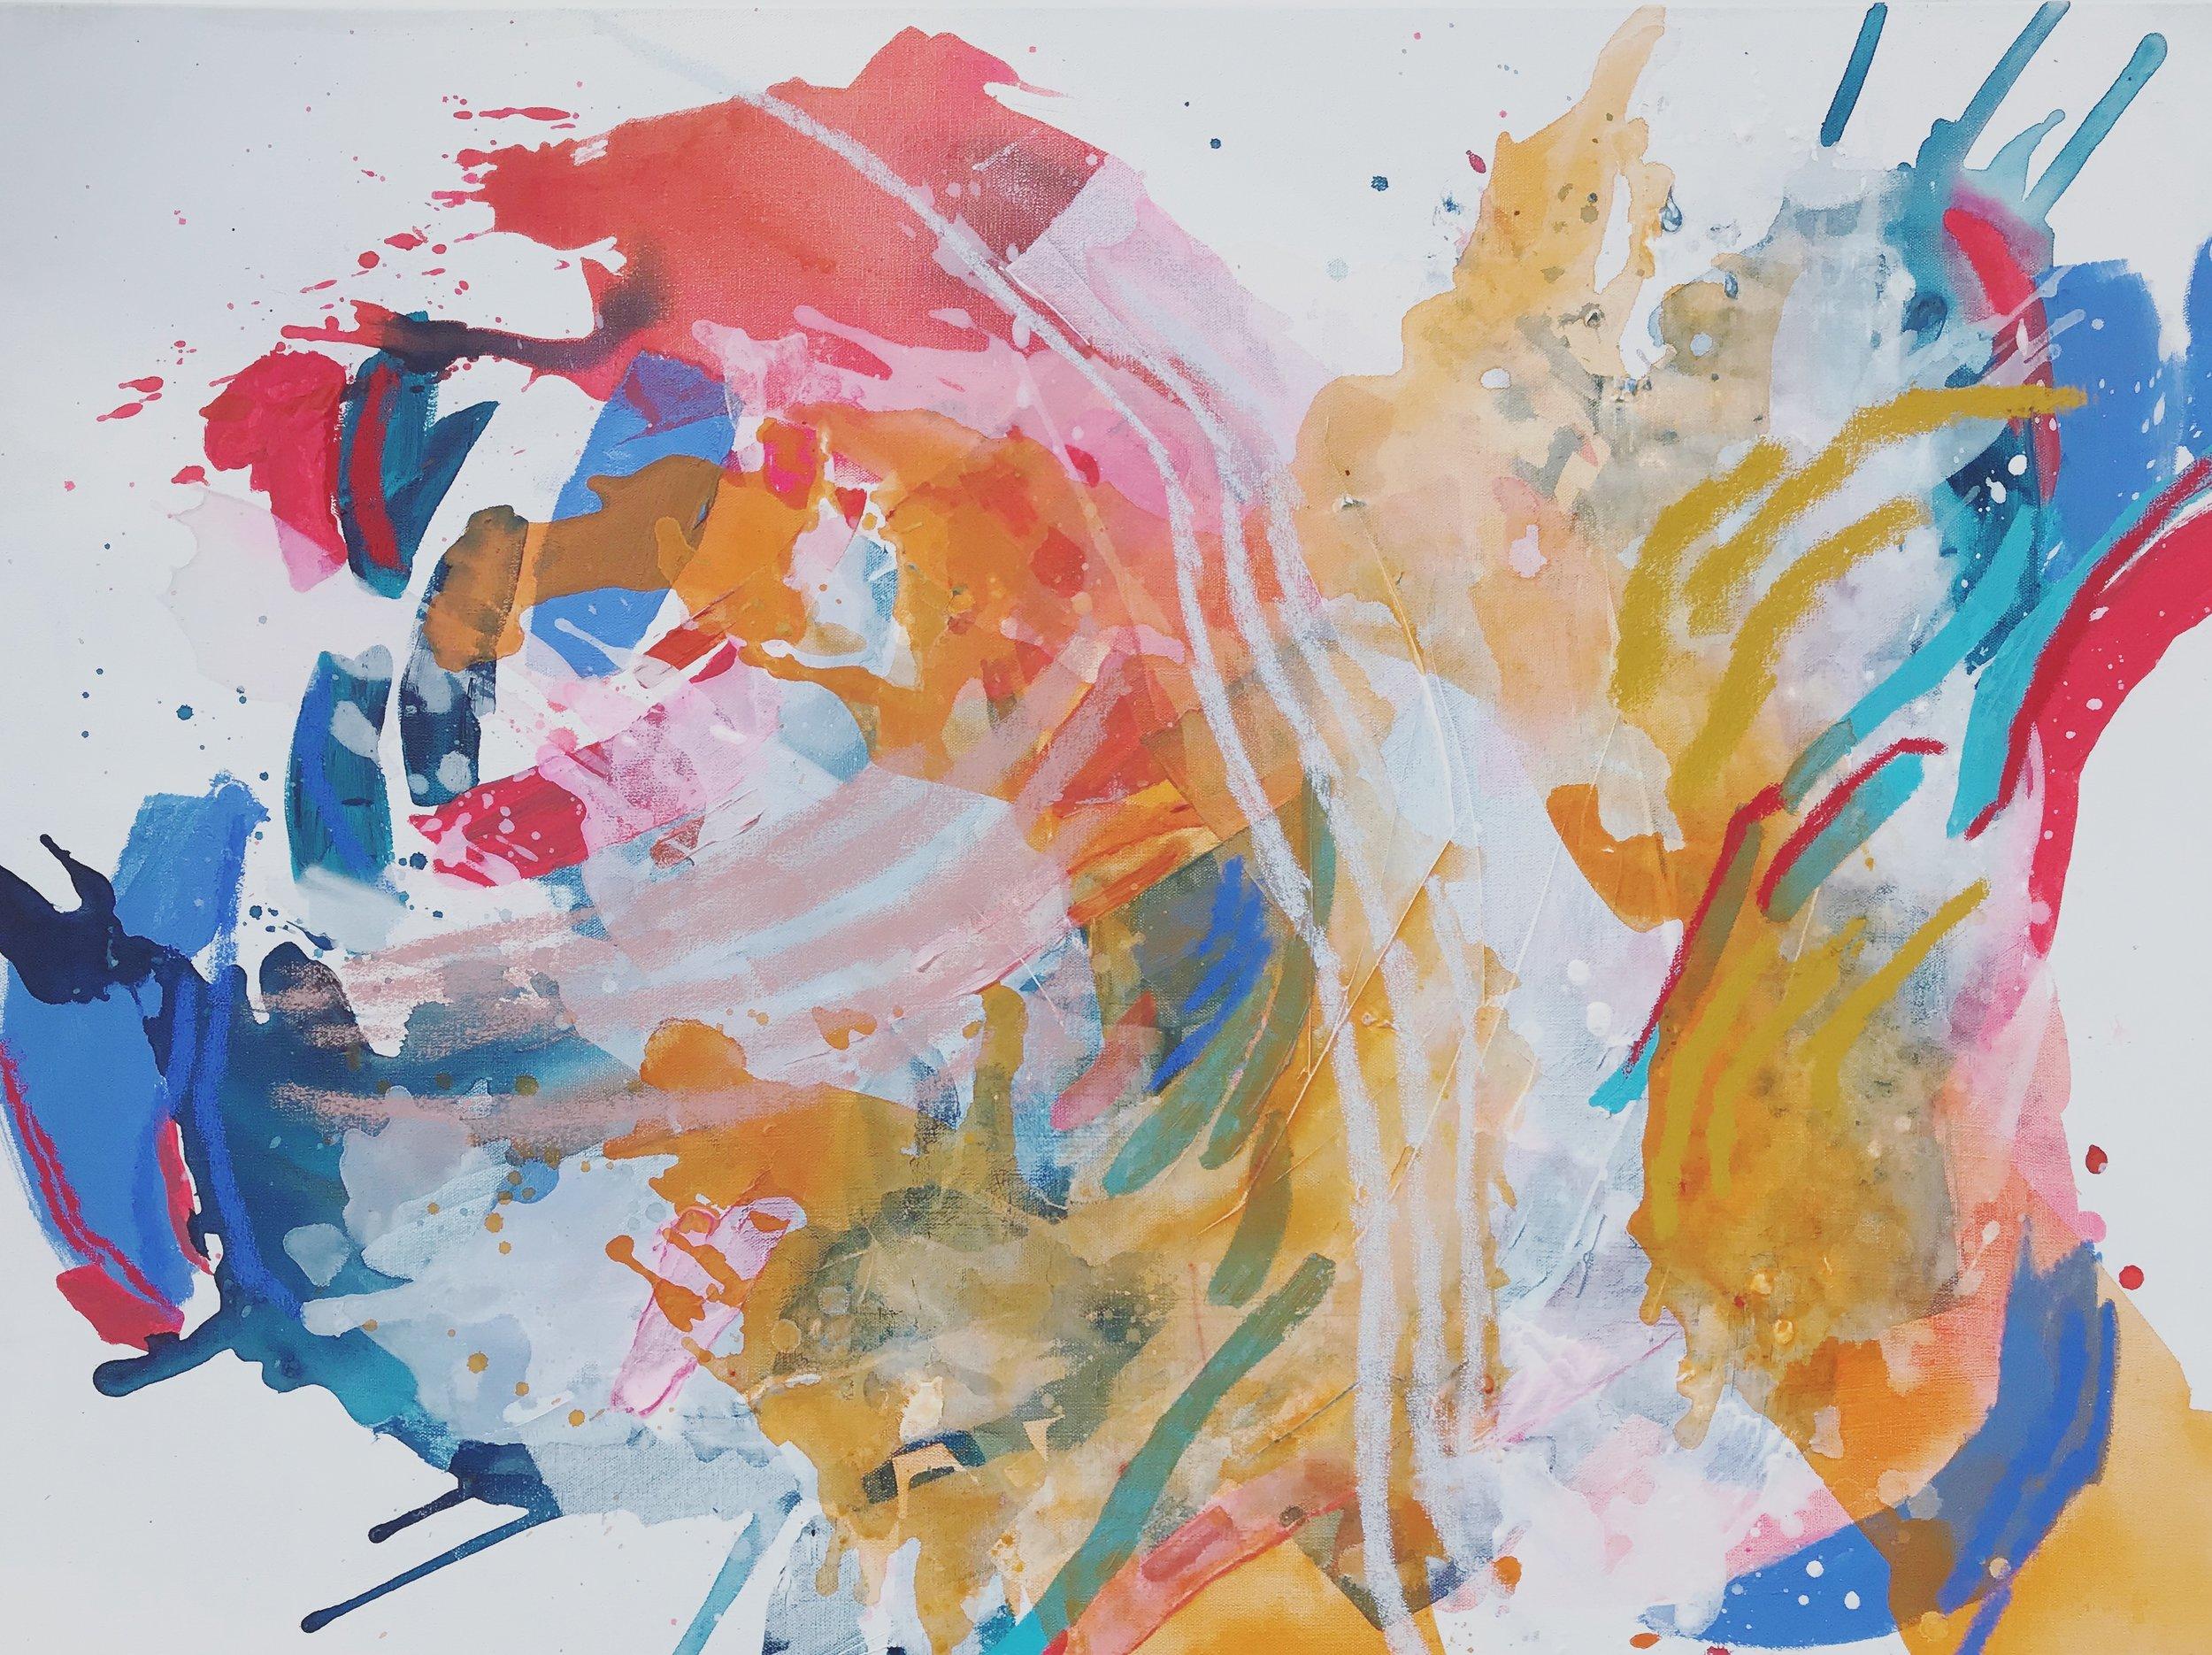 Bursting_Abstract Painting.JPG